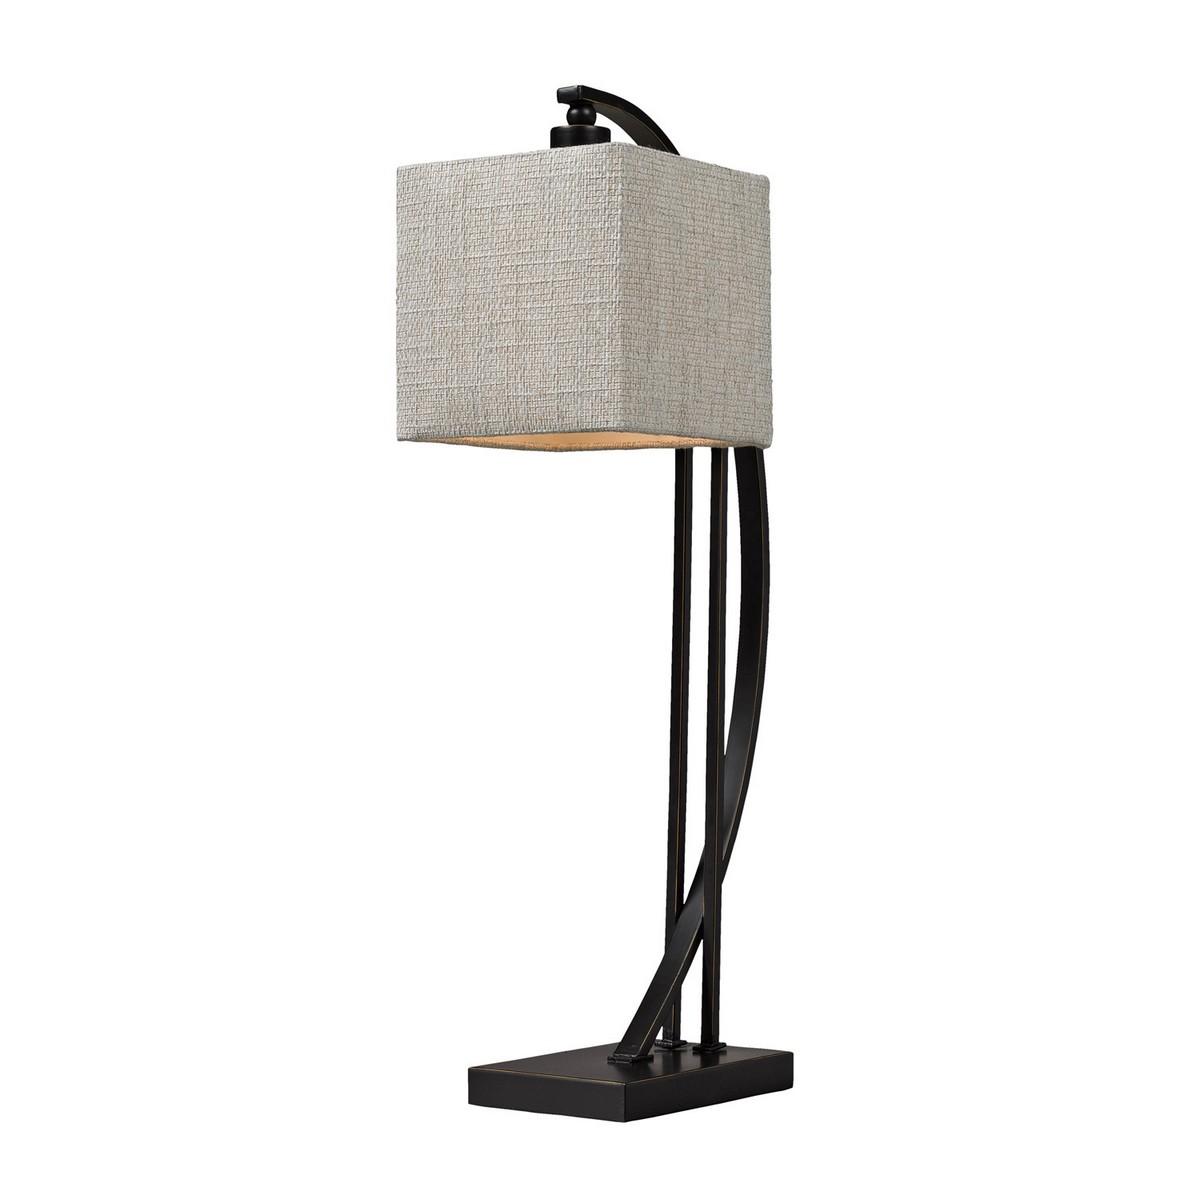 Elk Lighting D150 Table Lamp - Madison Bronze